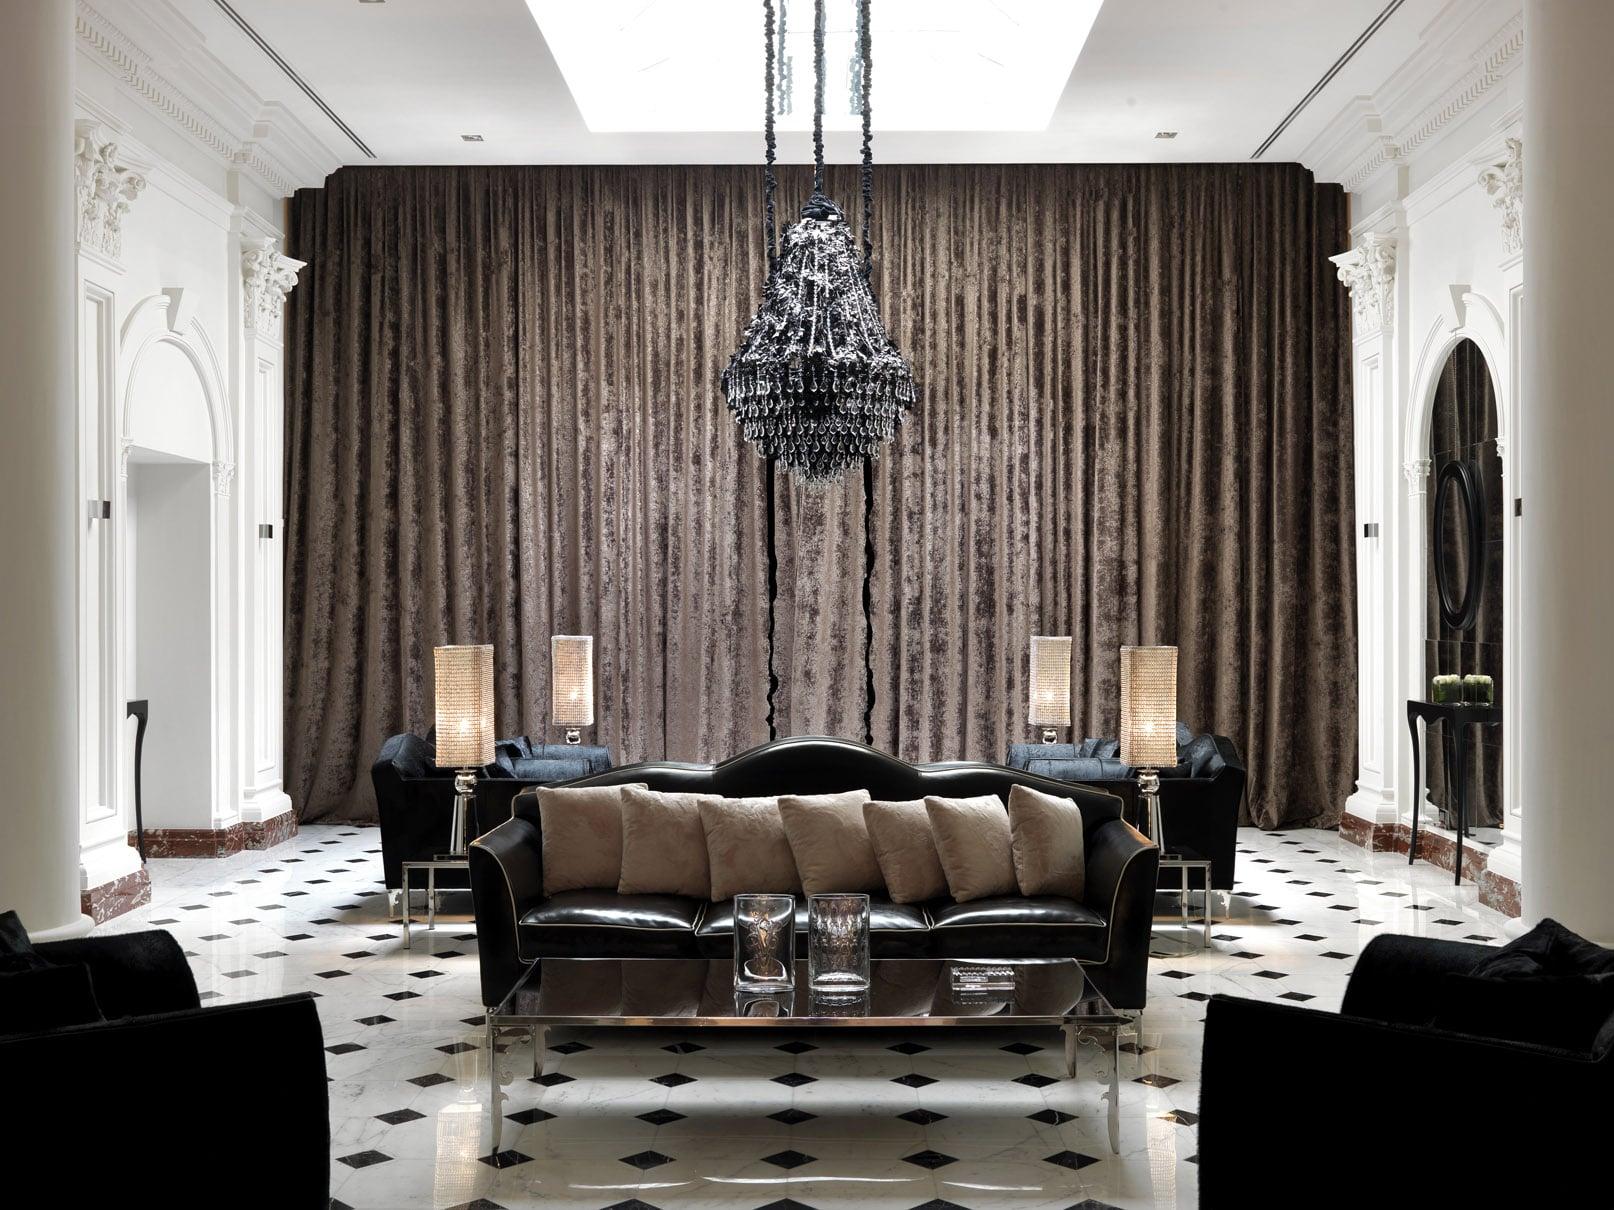 leon's place, hotel